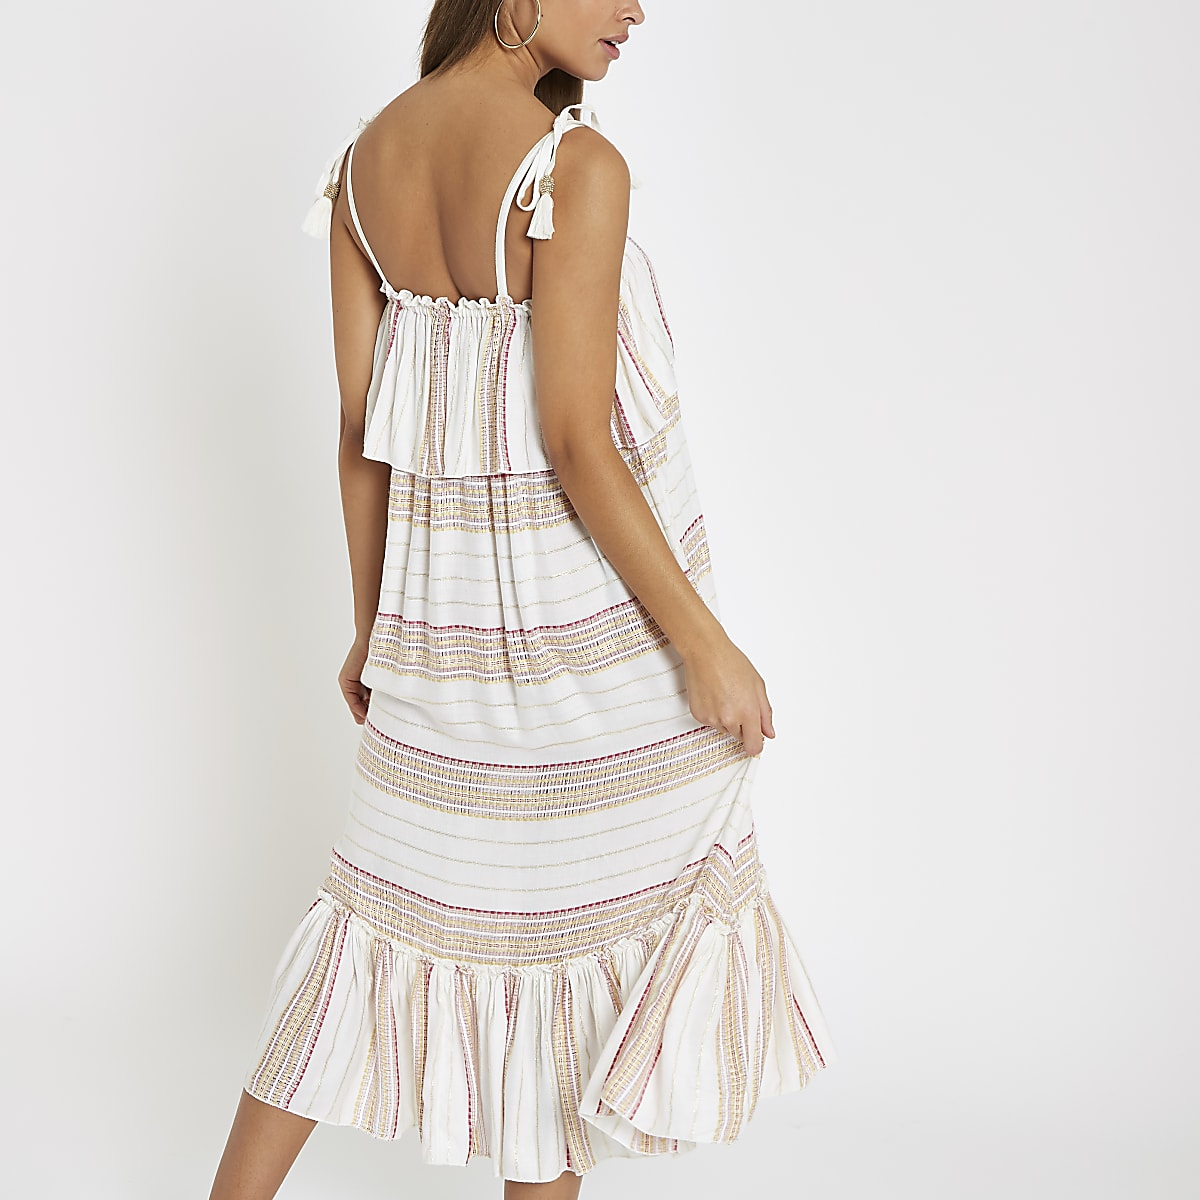 e5a79bfc5934f Cream stripe oversized midi beach dress - Kaftans & Beach Cover-Ups -  Swimwear & Beachwear - women